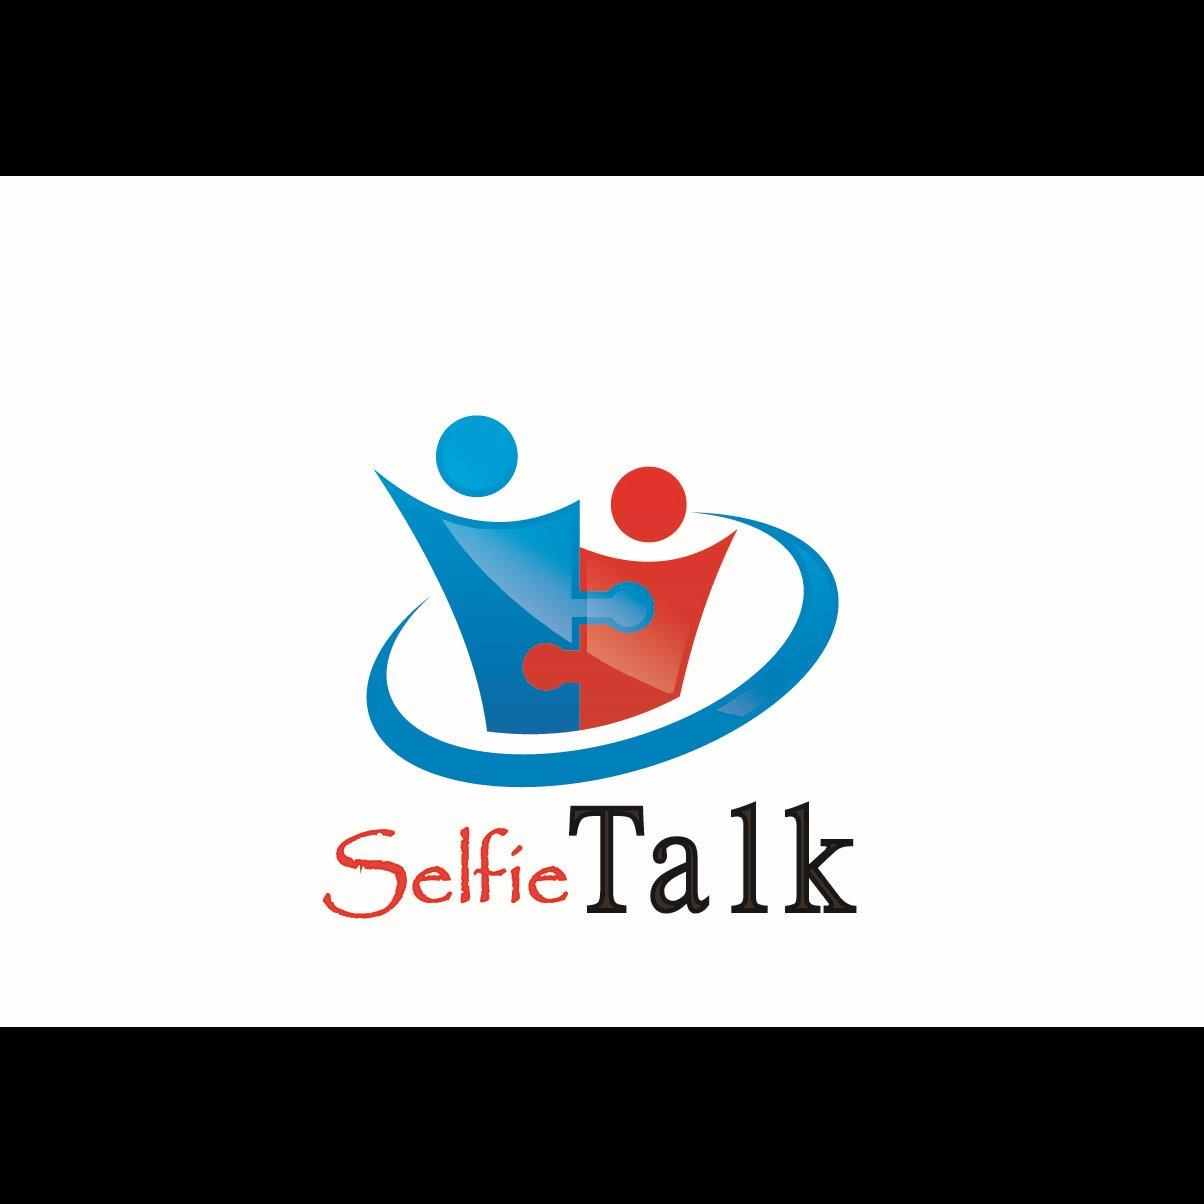 Selfie Talk